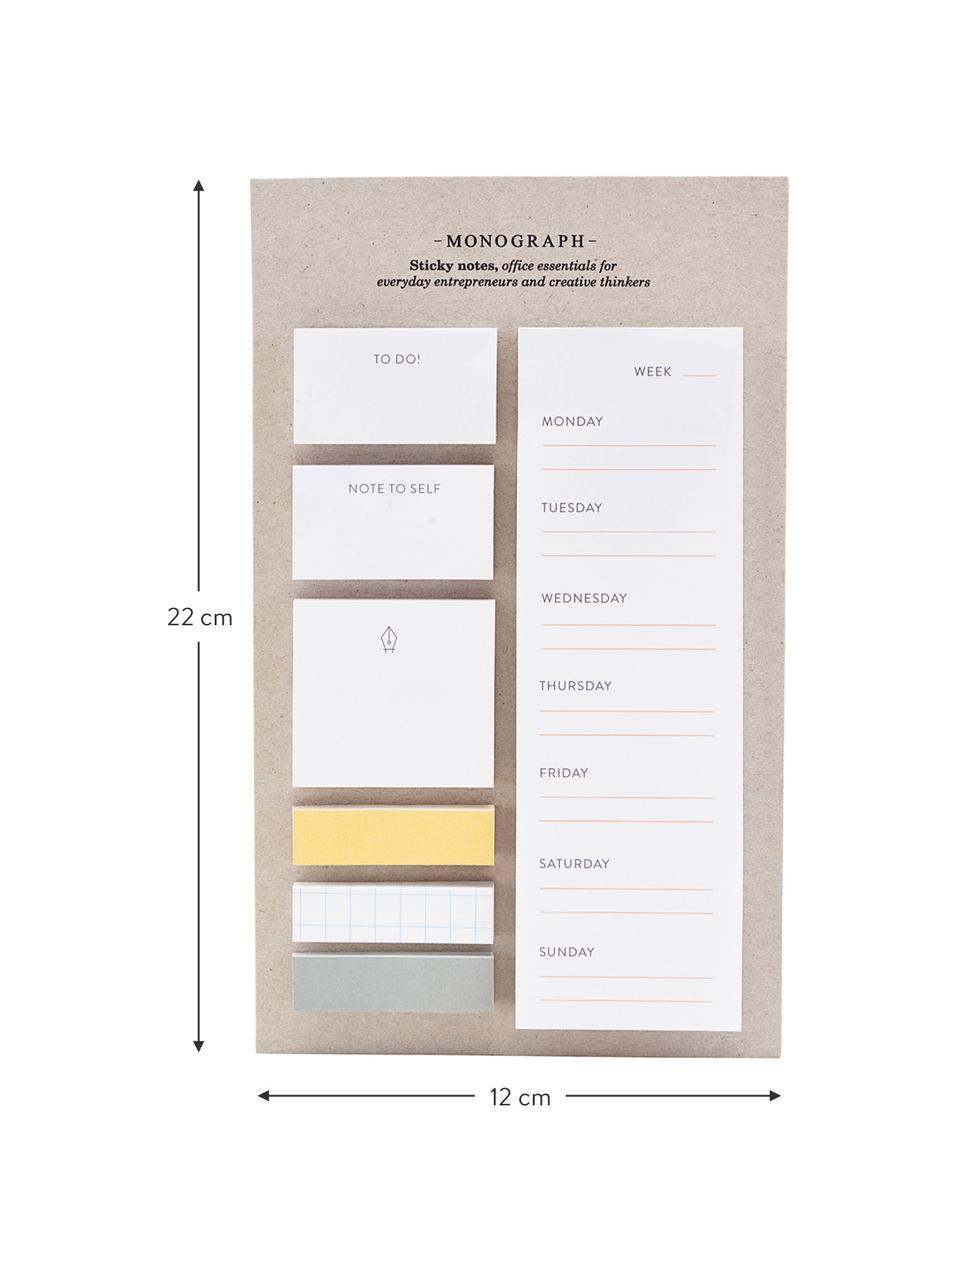 Haftnotiz-Block-Set Toffi, 7-tlg., Papier, Weiß, Gelb, Grau, 12 x 22 cm